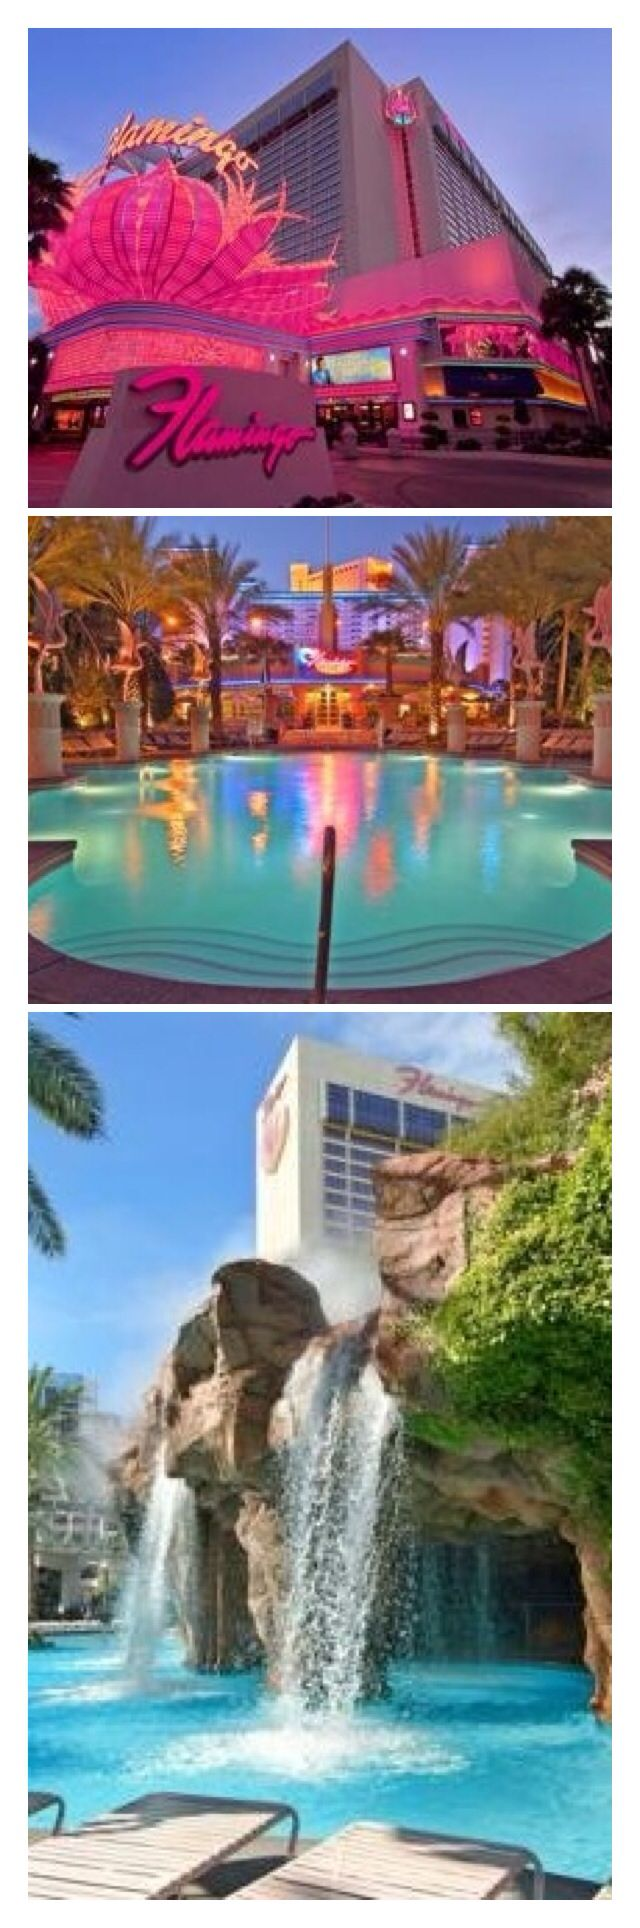 The Flamingo Hotel - Las Vegas Strip Nevada | House of Beccaria#